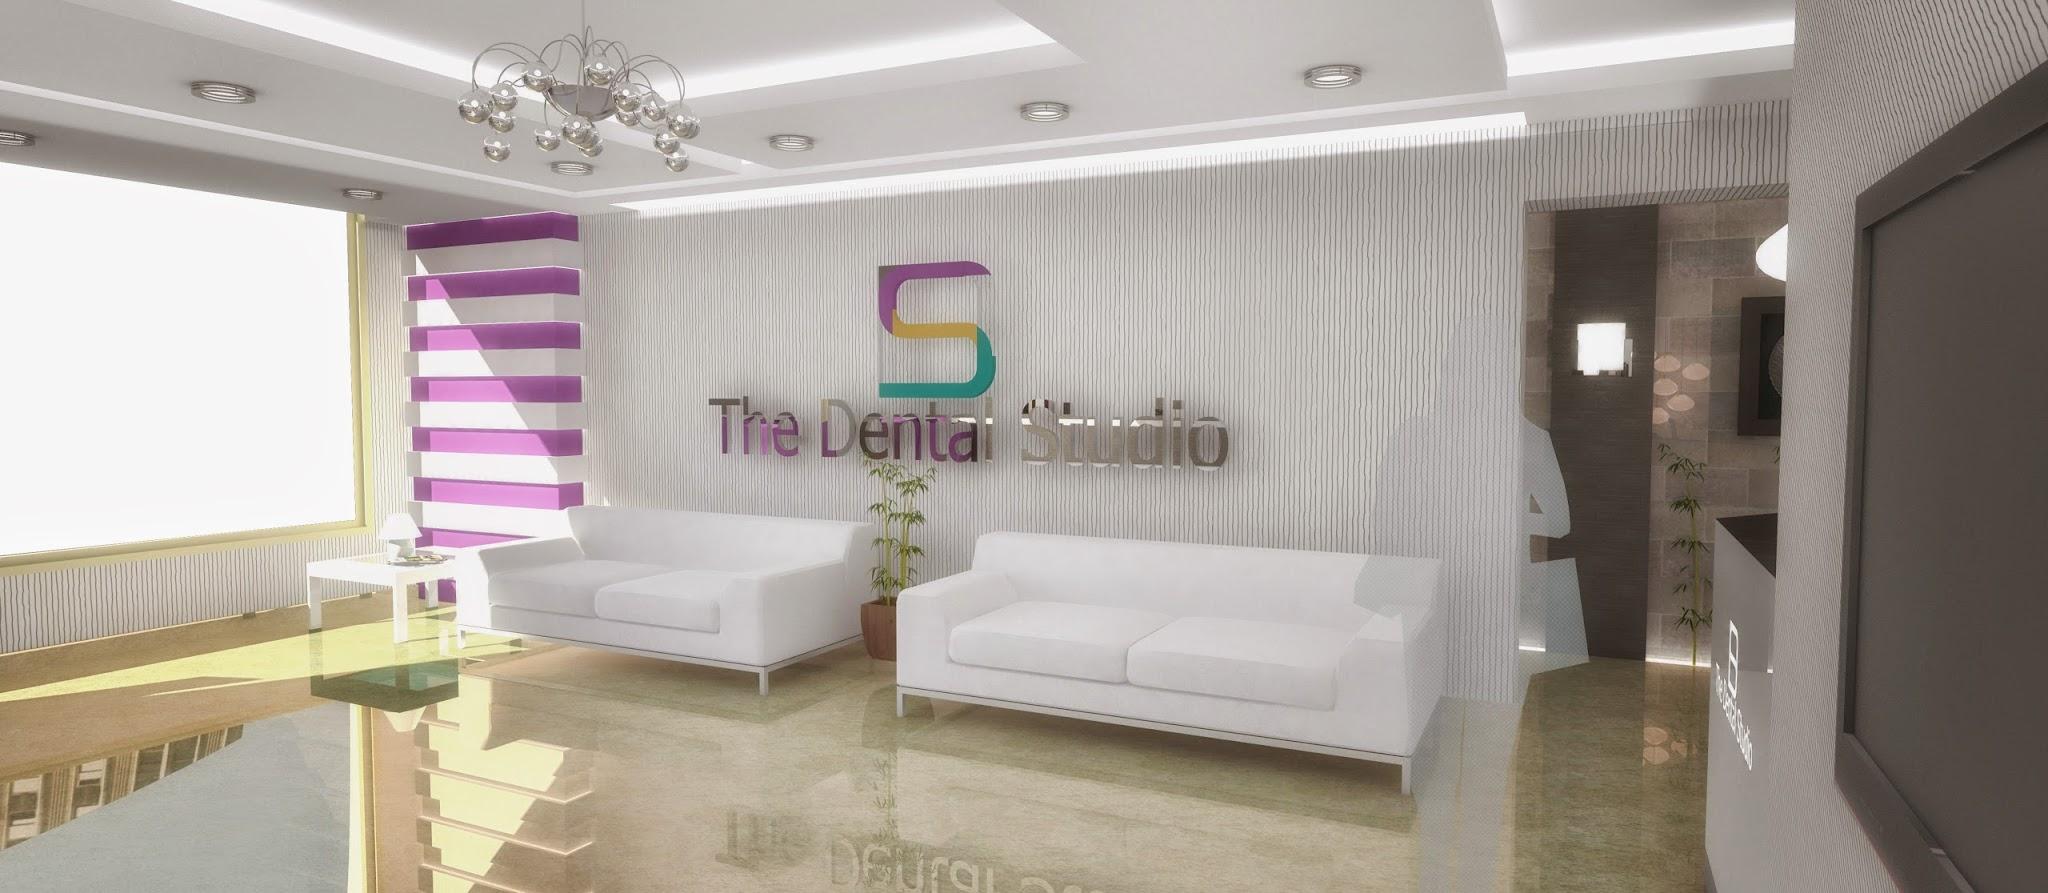 interior design ideas dental clinic